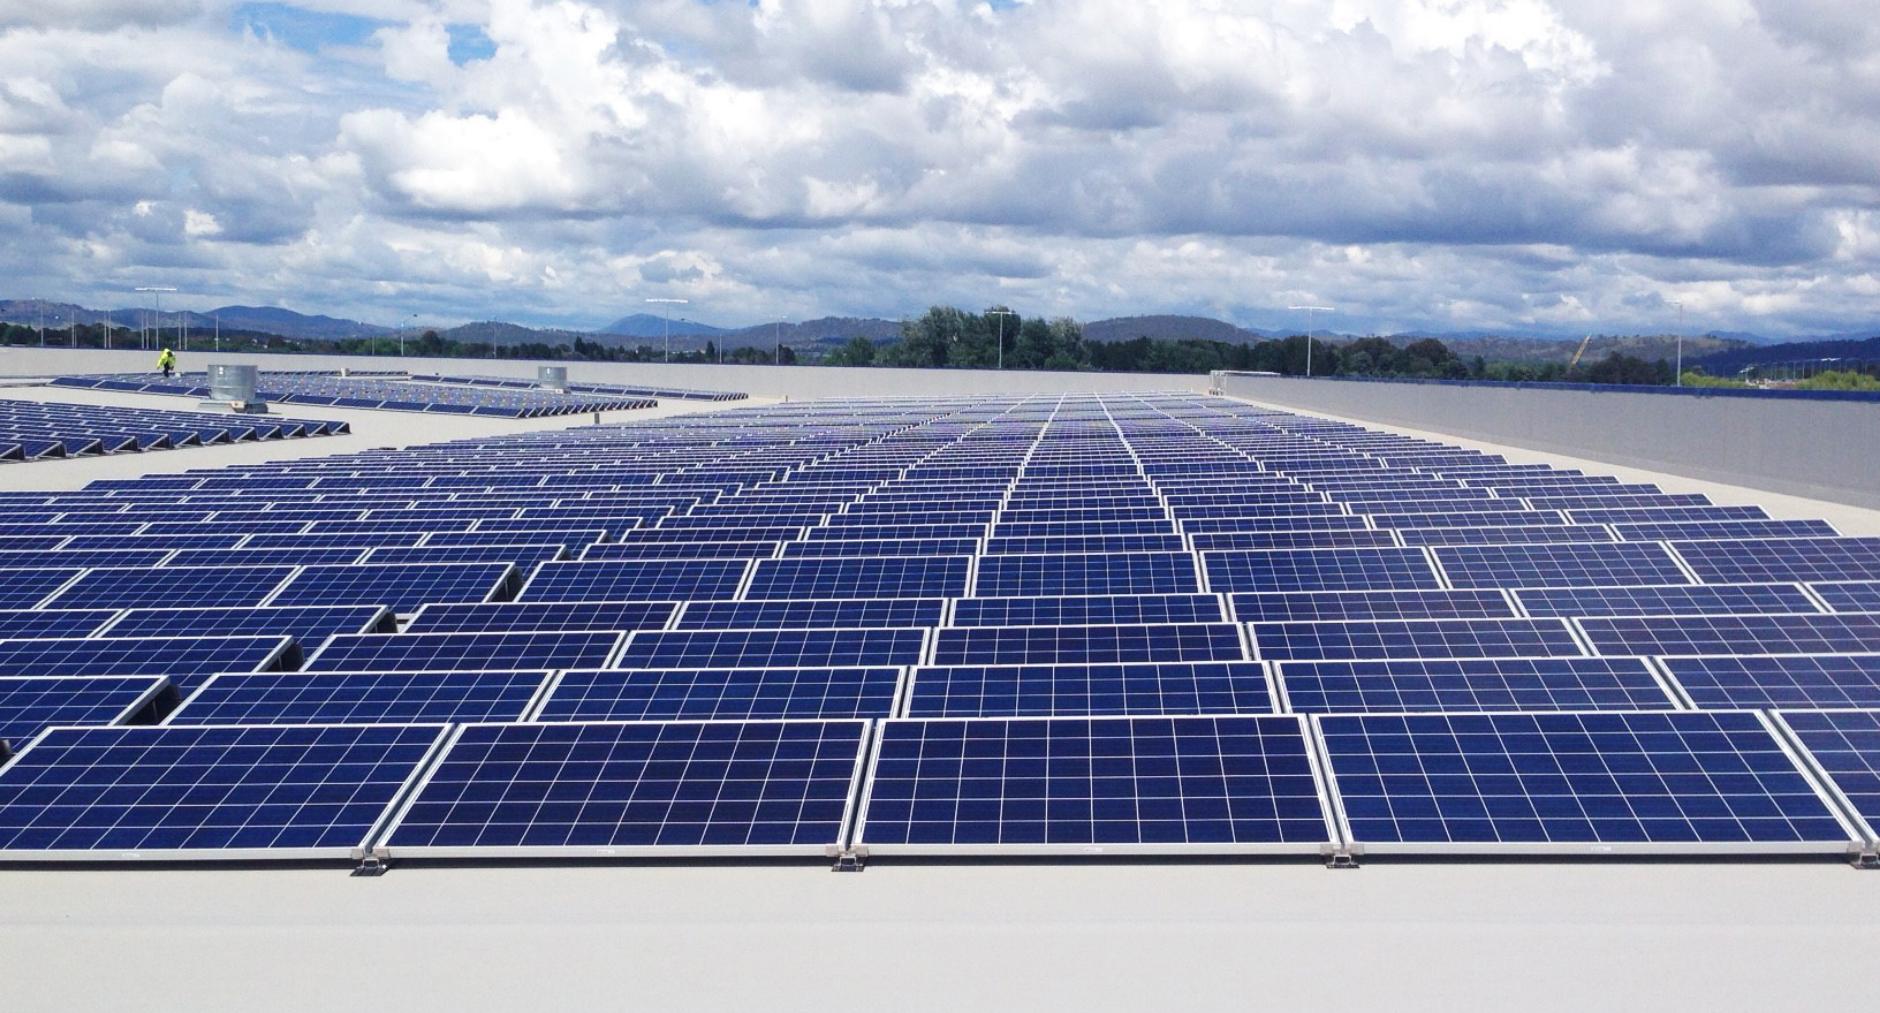 RFI powers Sydney metro trains facility with 1.12 MW rooftop solar plant